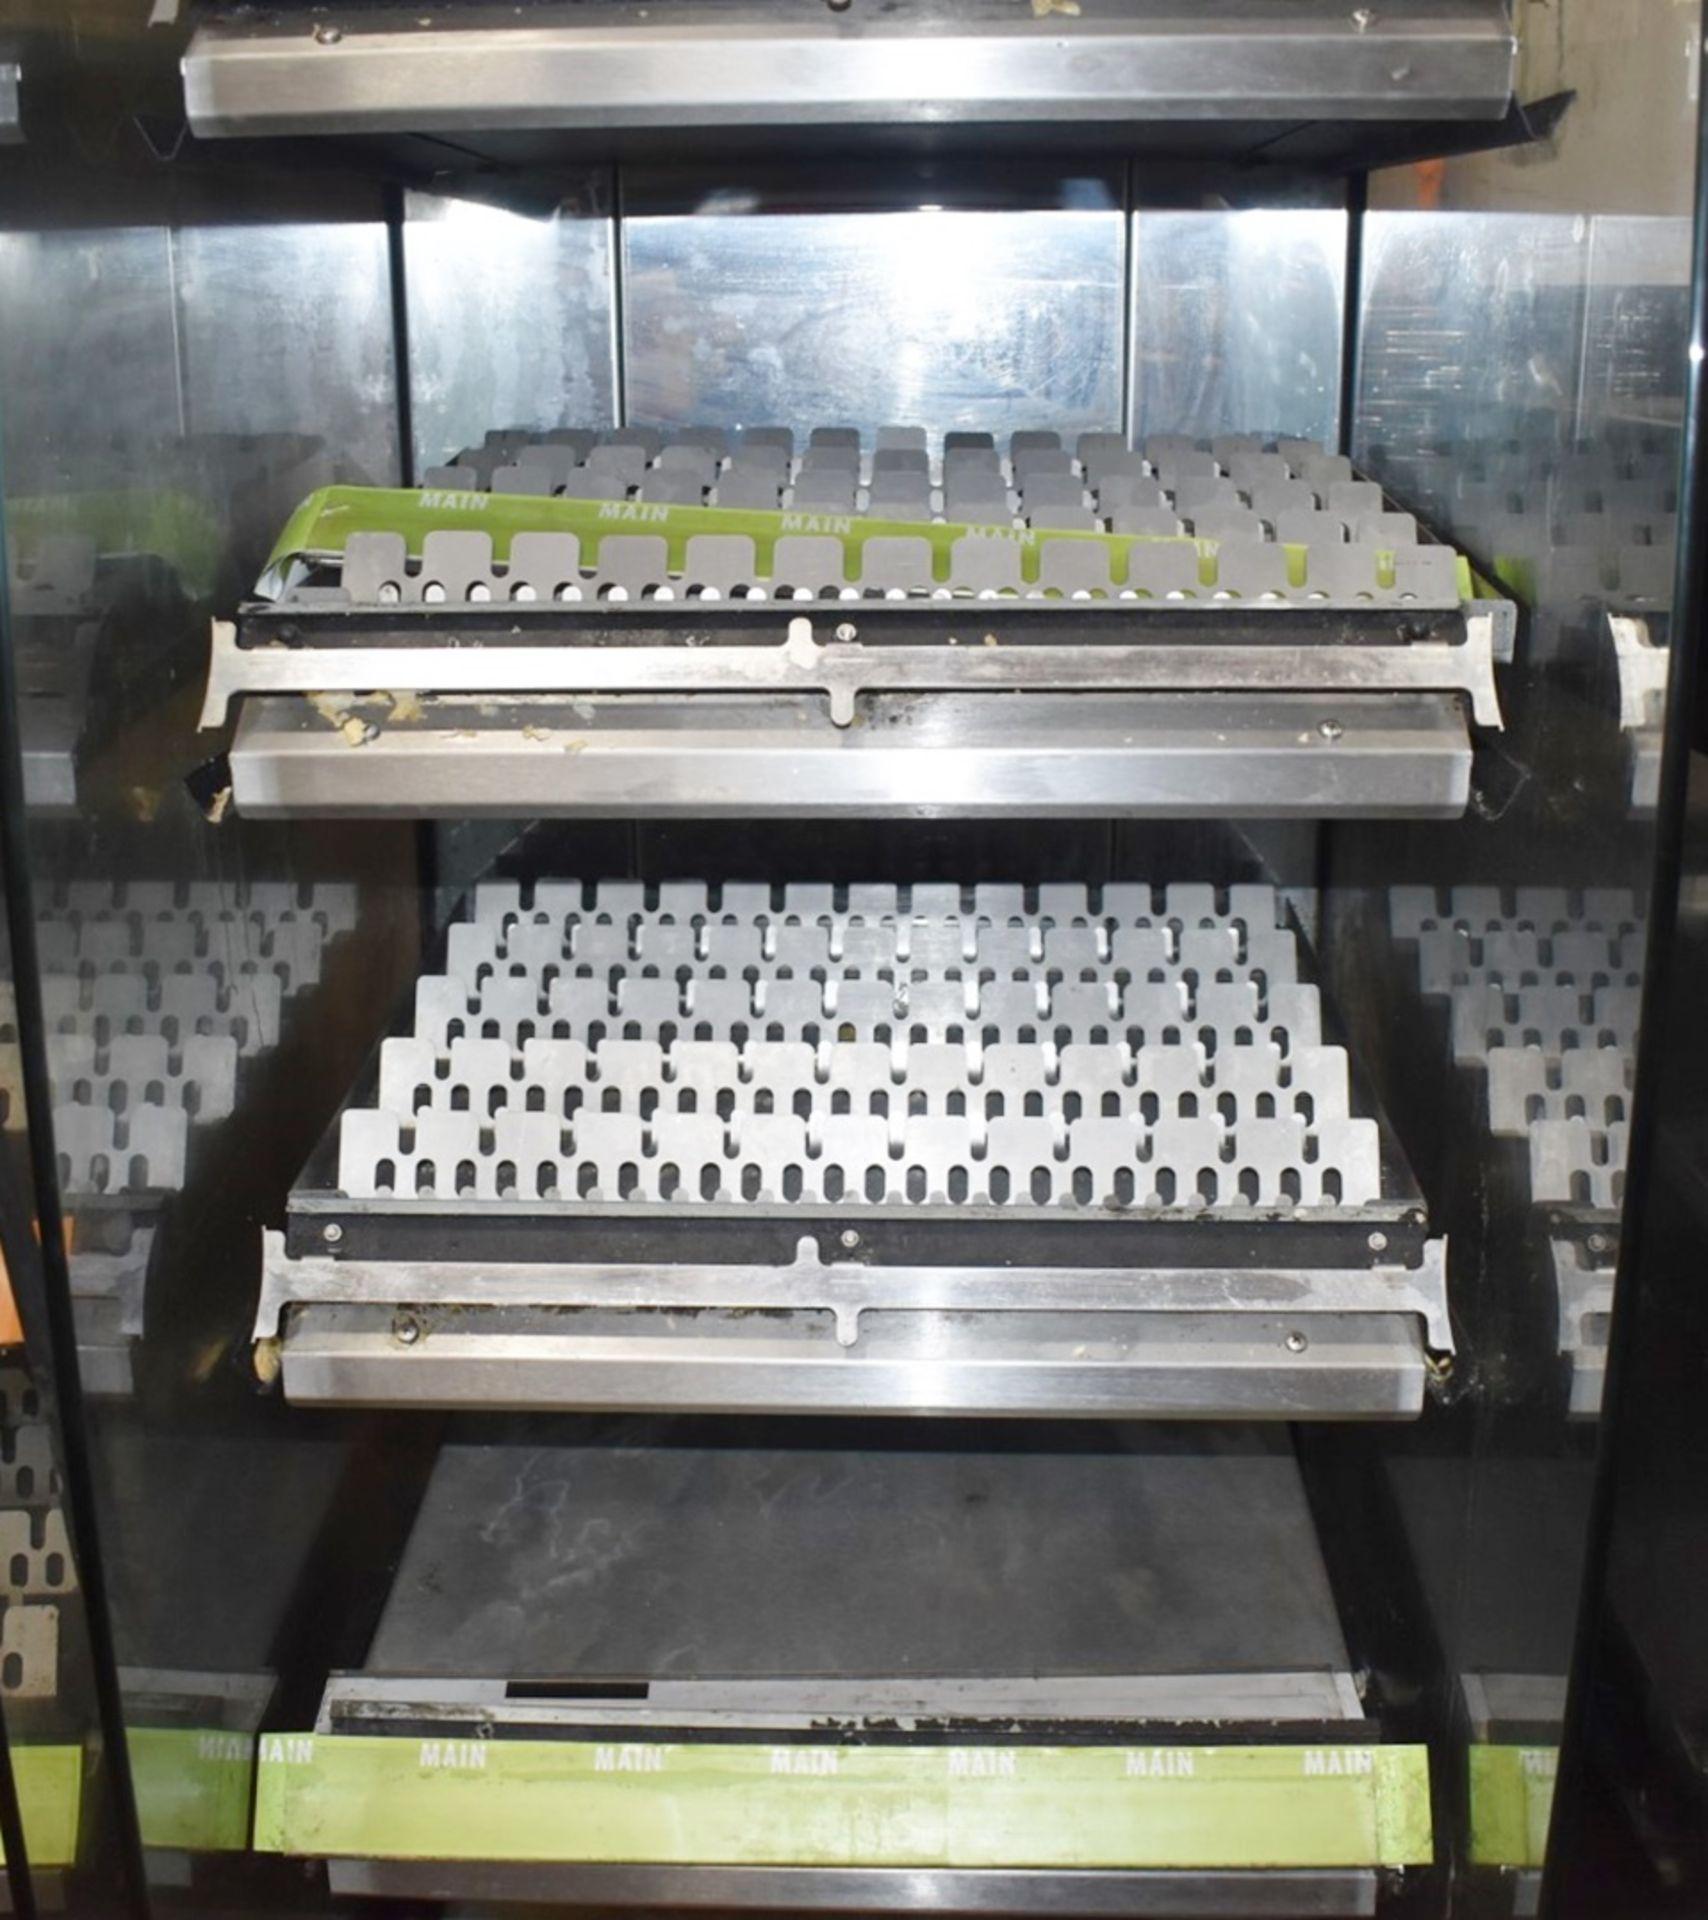 1 x Frijado Multi Deck 60 5 Level Heated Grab and Go Display Warmer - 400v 3 Phase - H197 x W60 x - Image 3 of 3